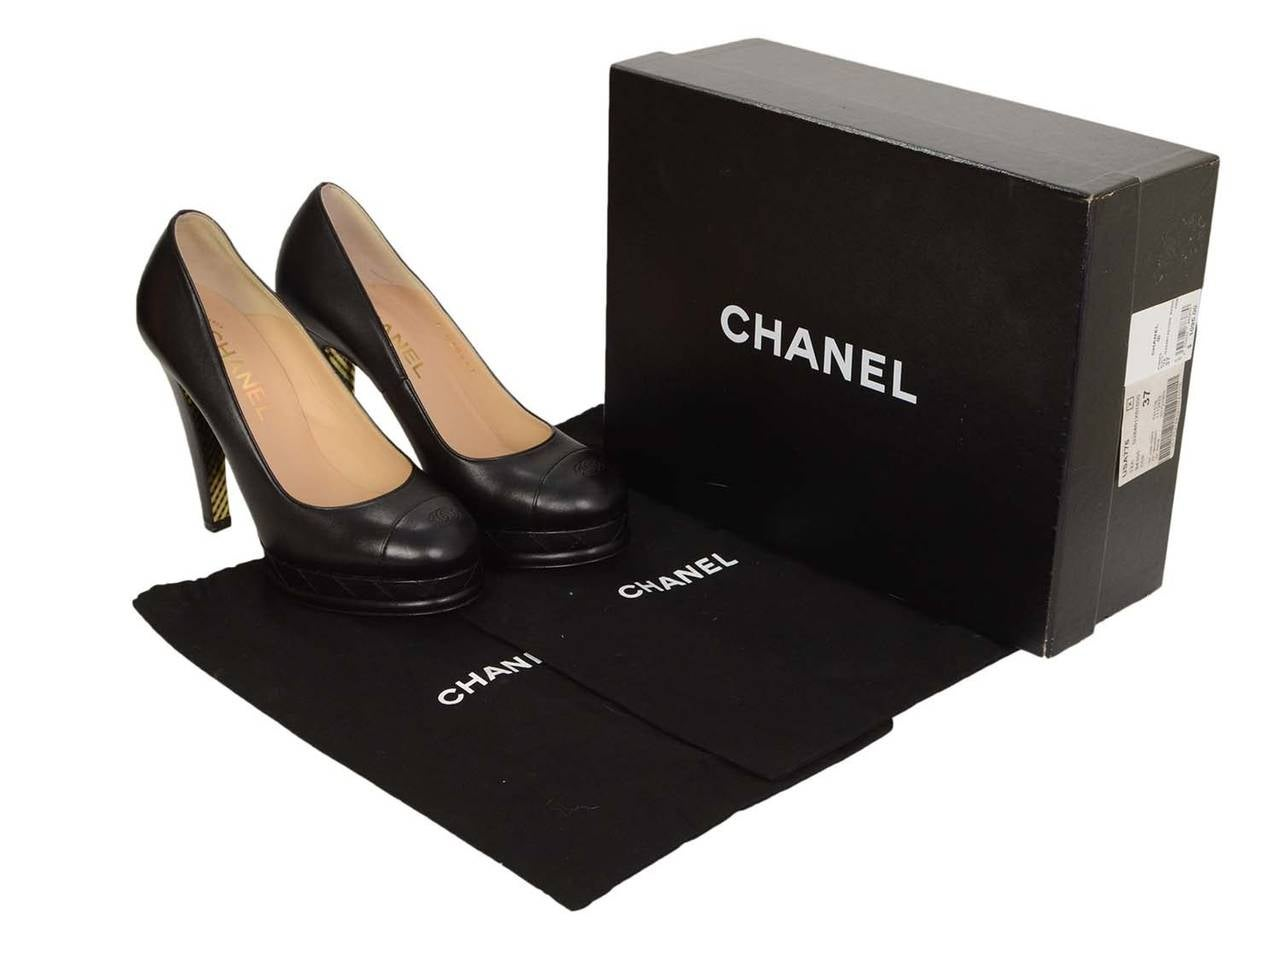 CHANEL Black Leather Round Toe Pumps sz 37 7